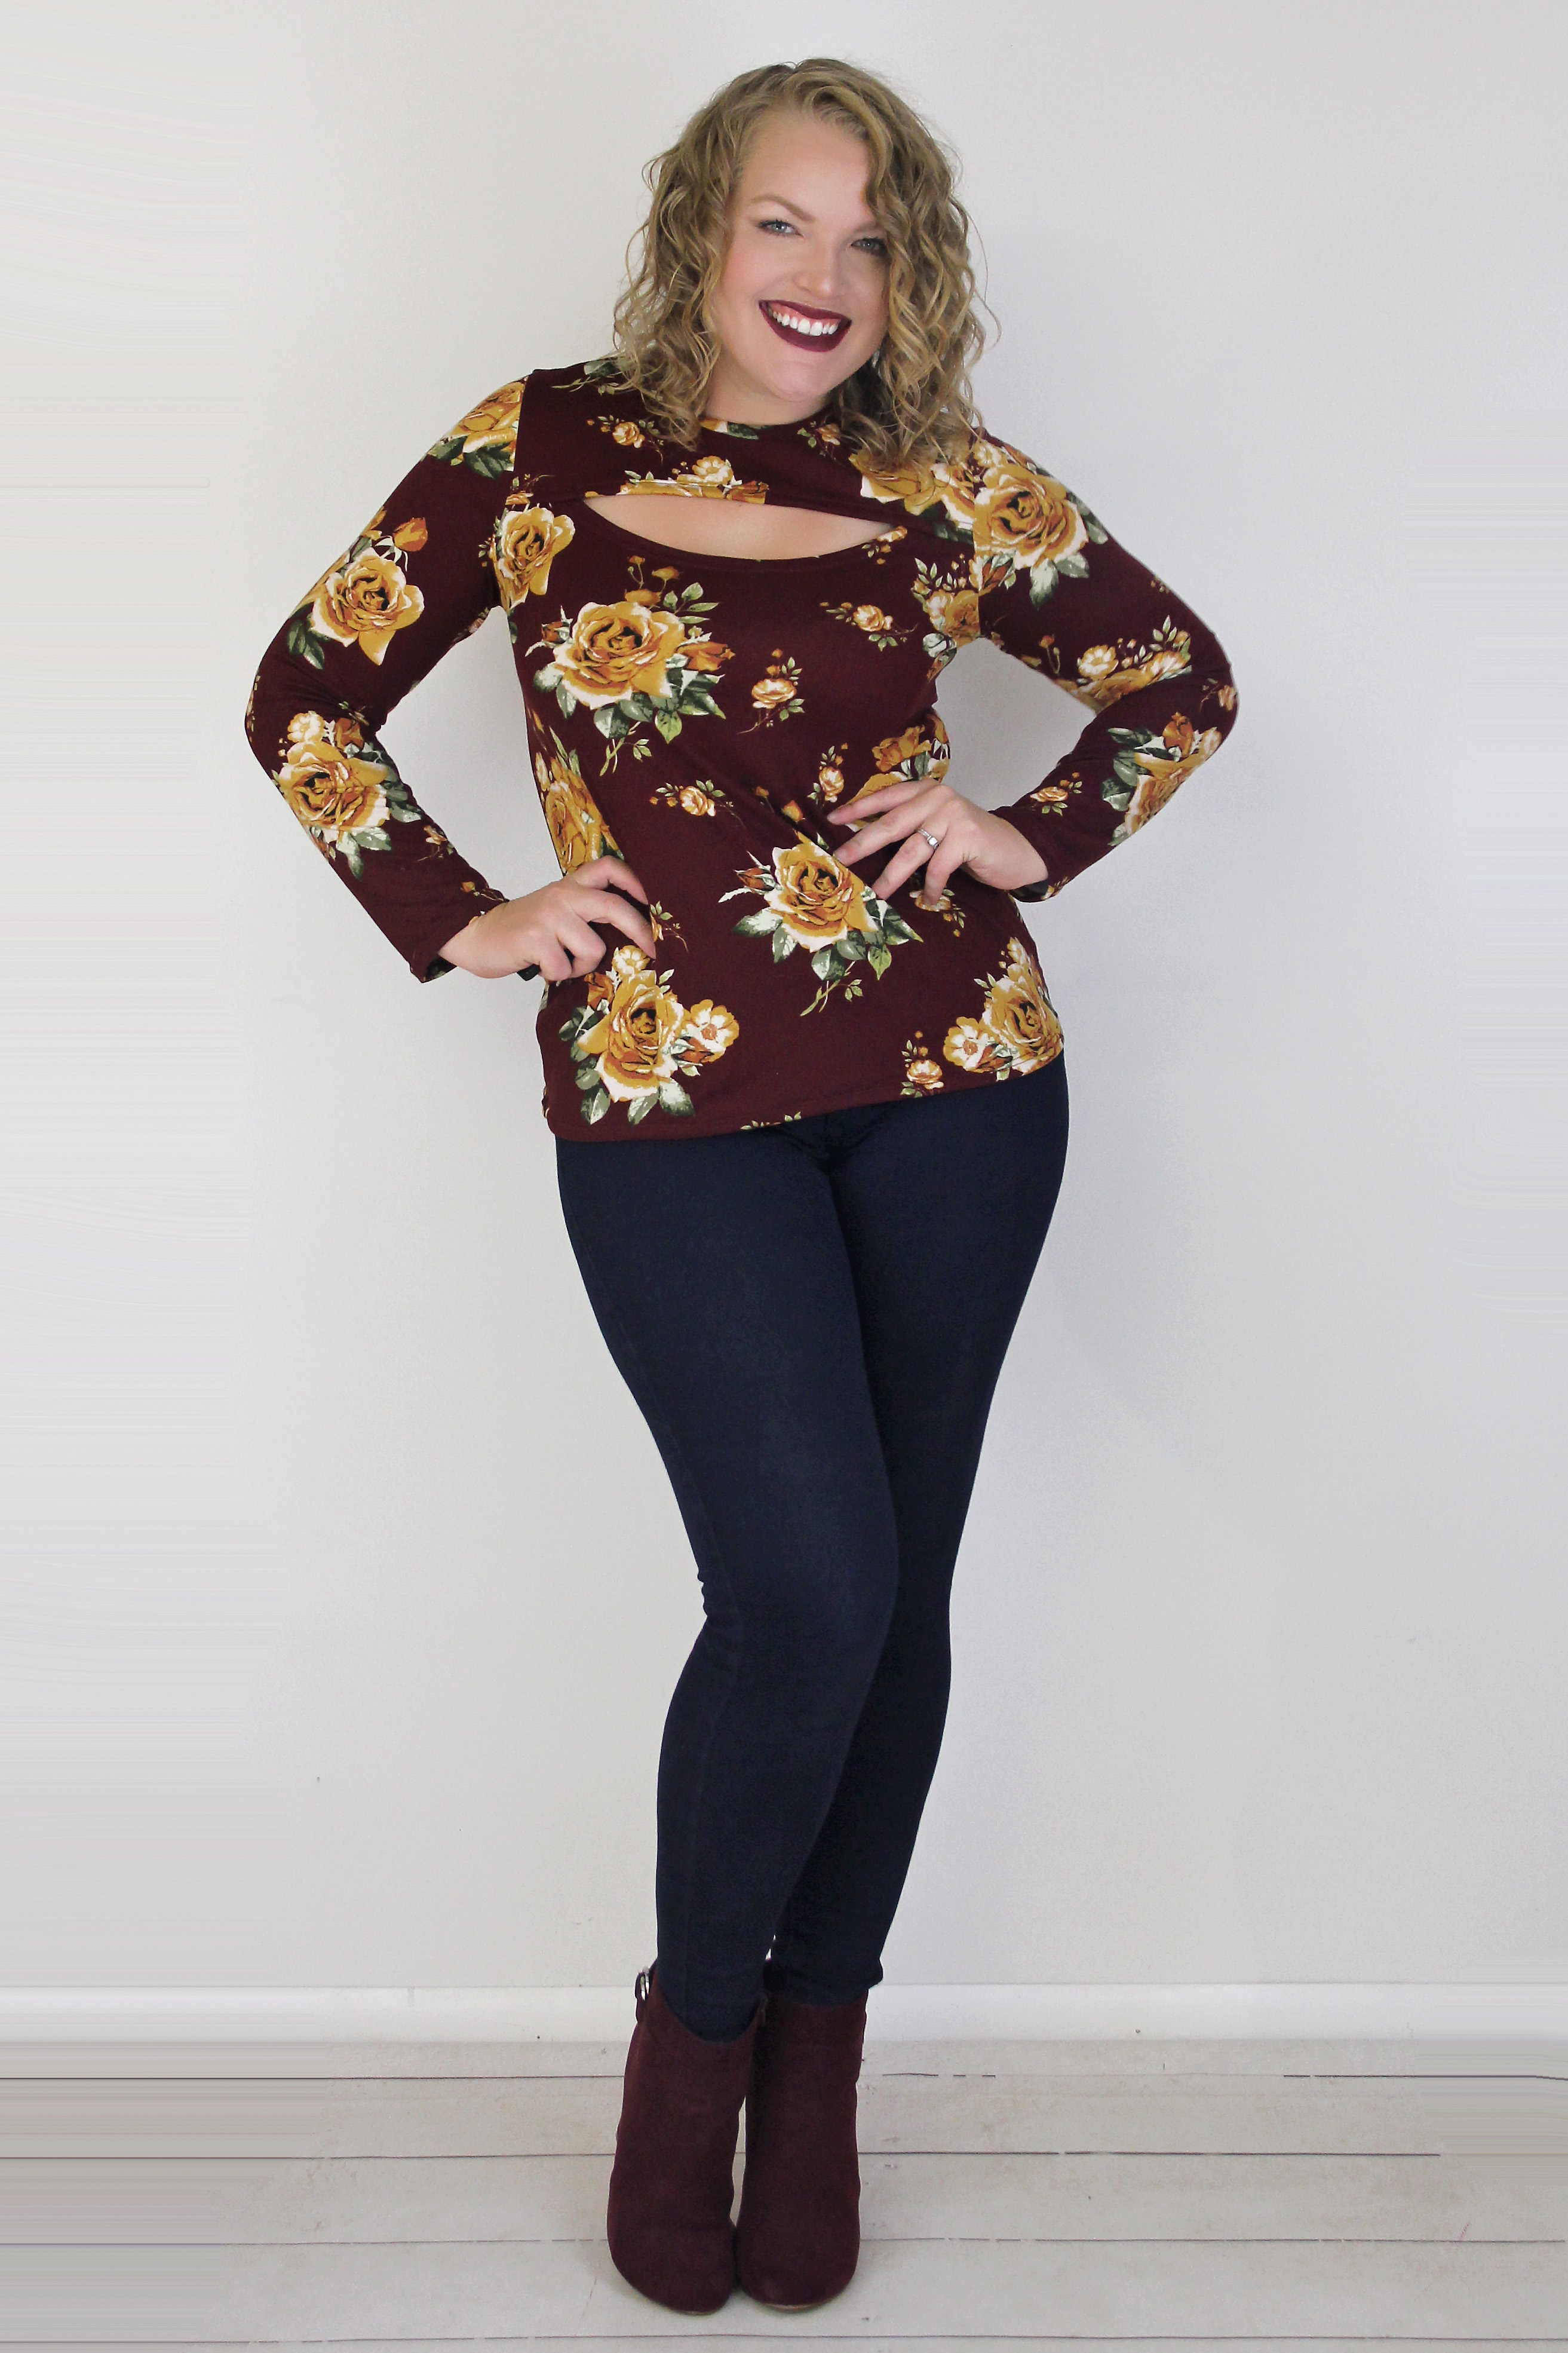 Kimora's Keyhole Top and Dress Sizes XXS to 3X Adults PDF Pattern